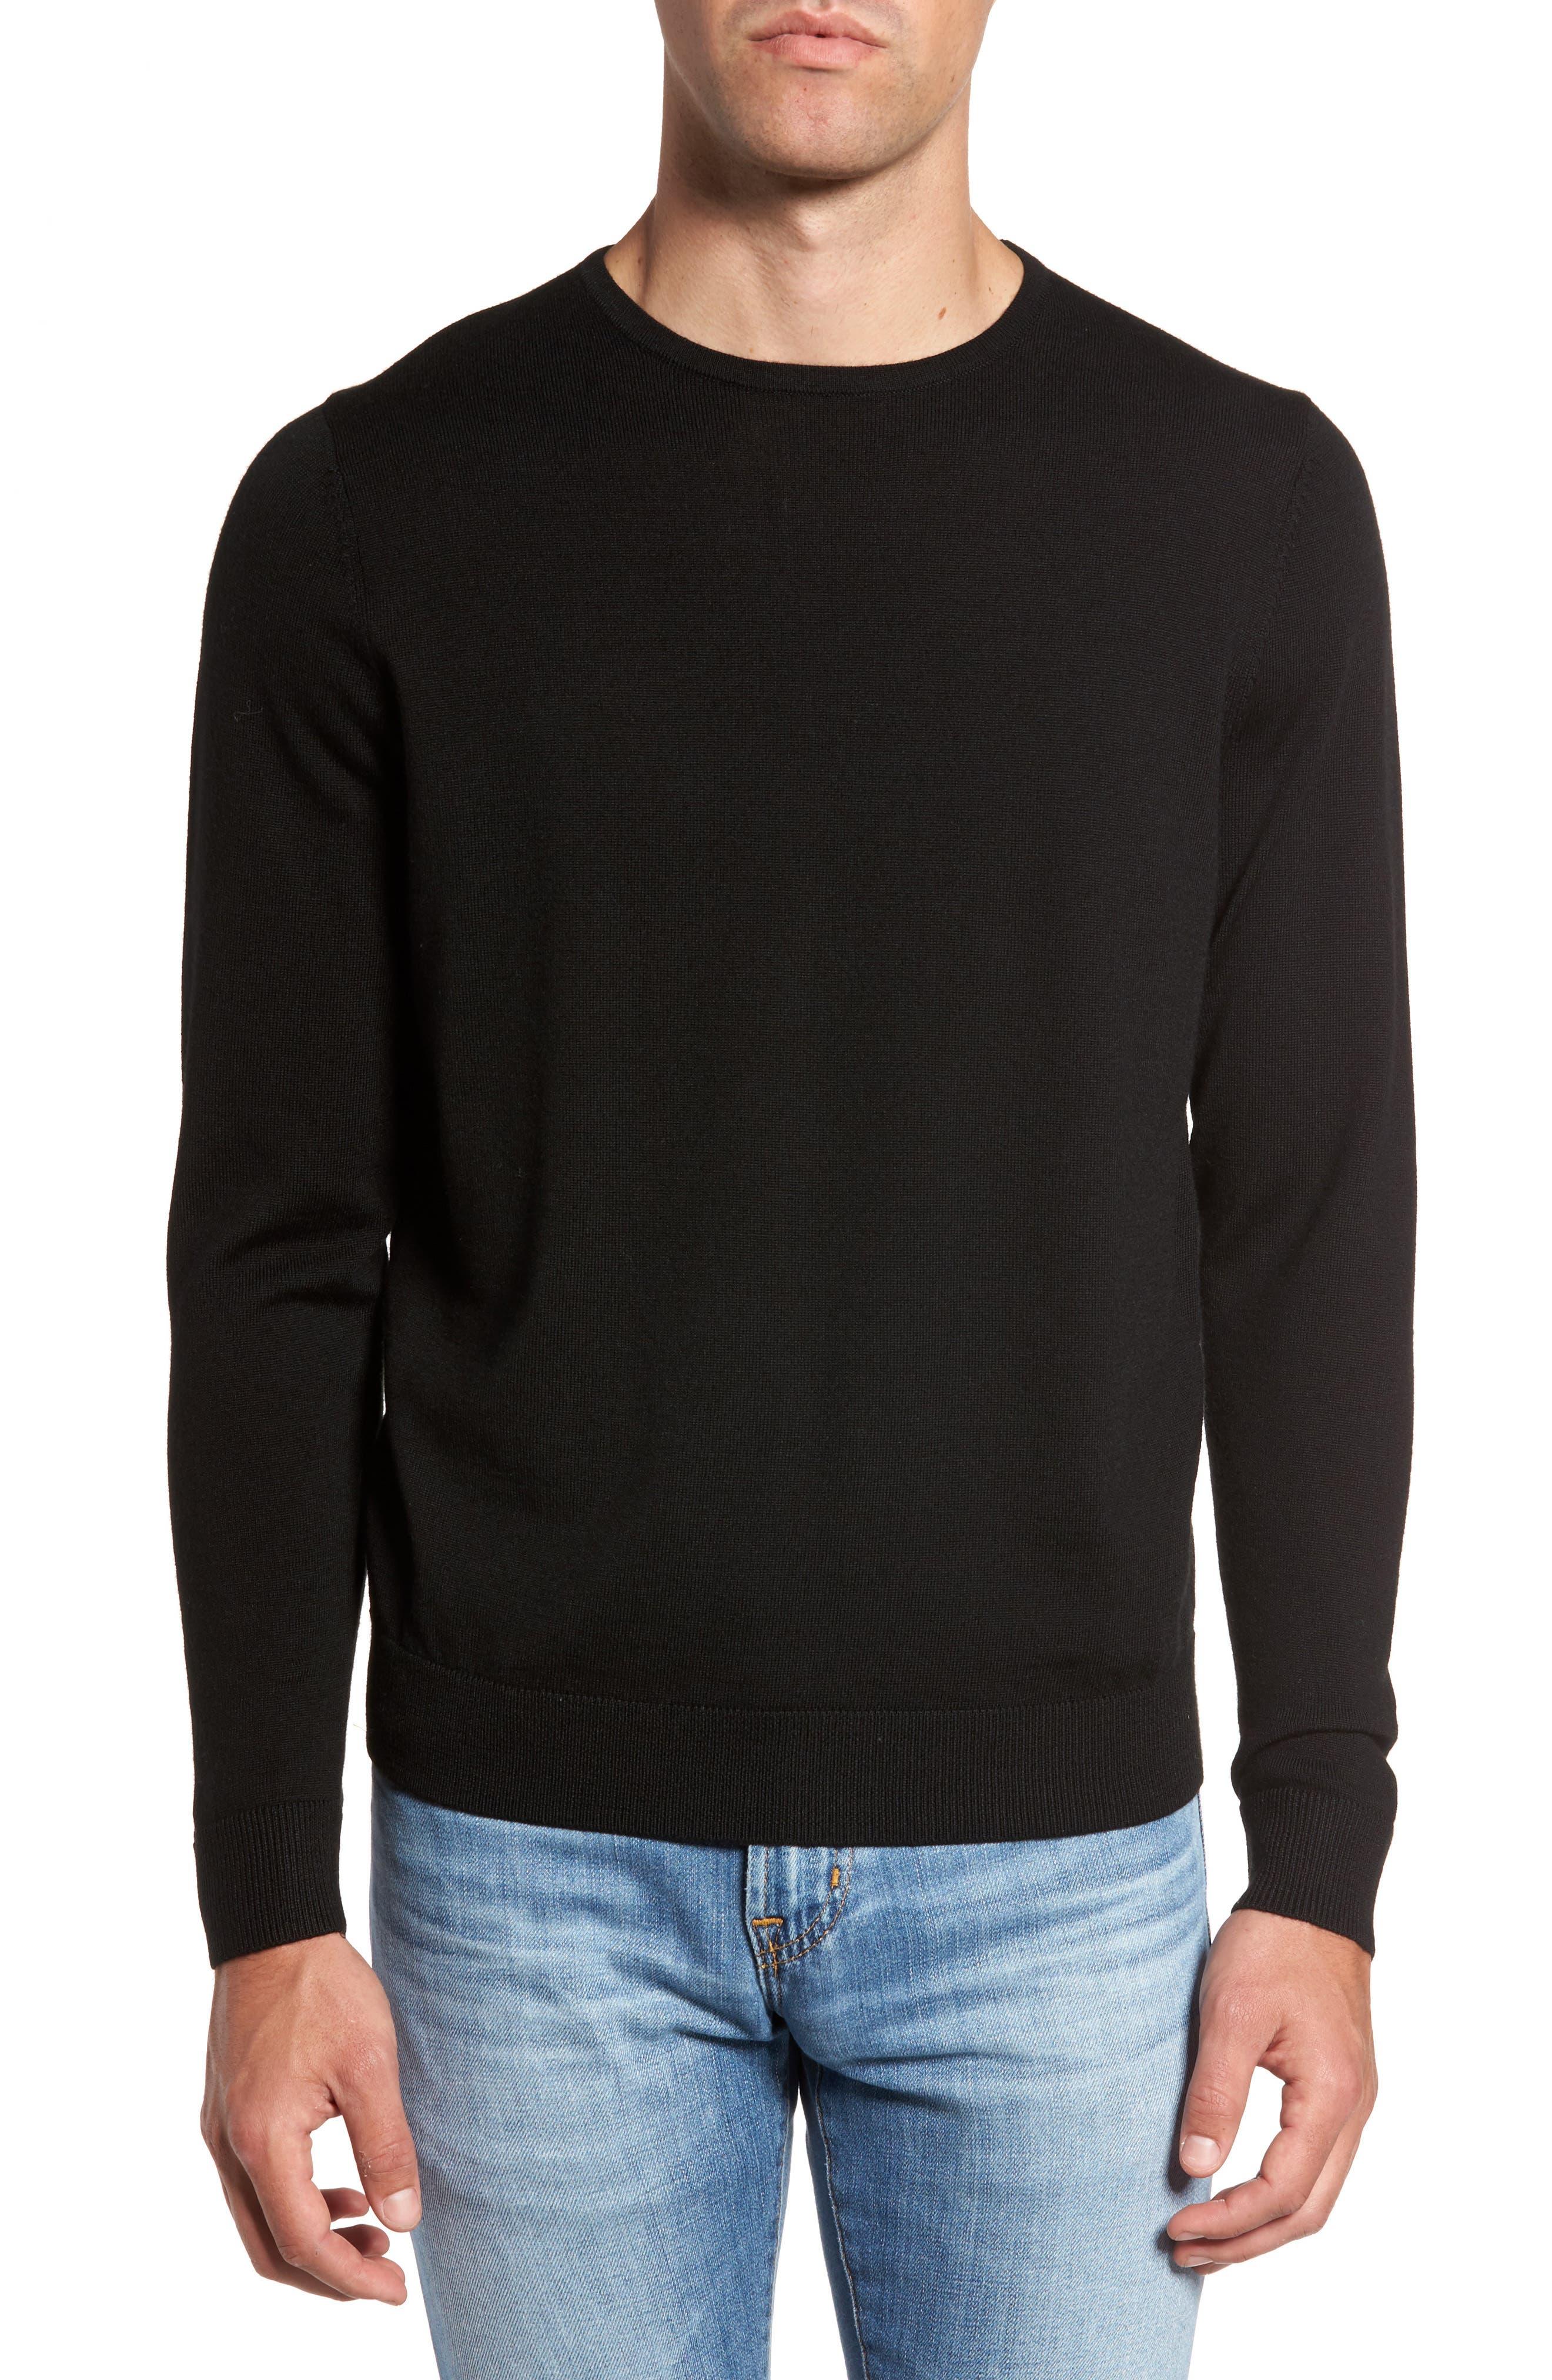 Crewneck Merino Wool Sweater,                             Main thumbnail 1, color,                             BLACK CAVIAR